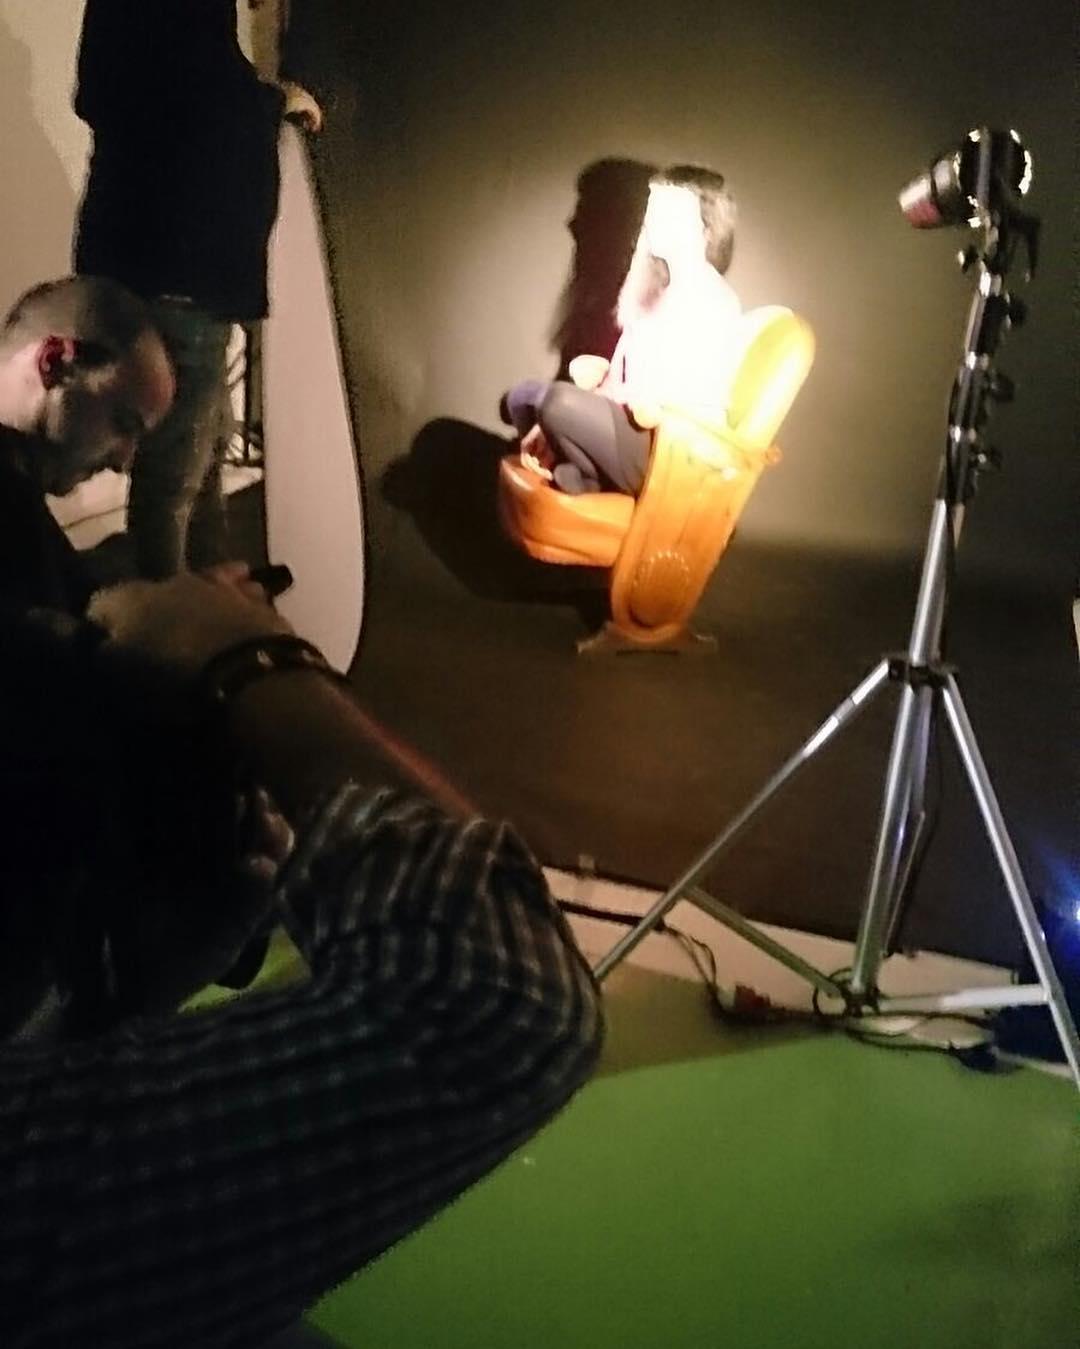 Profesora taller de escritura convertida un rato en modelo de #fotografiaerotica en #comudelamassana ;)) Foto del maravilloso @marco_blued